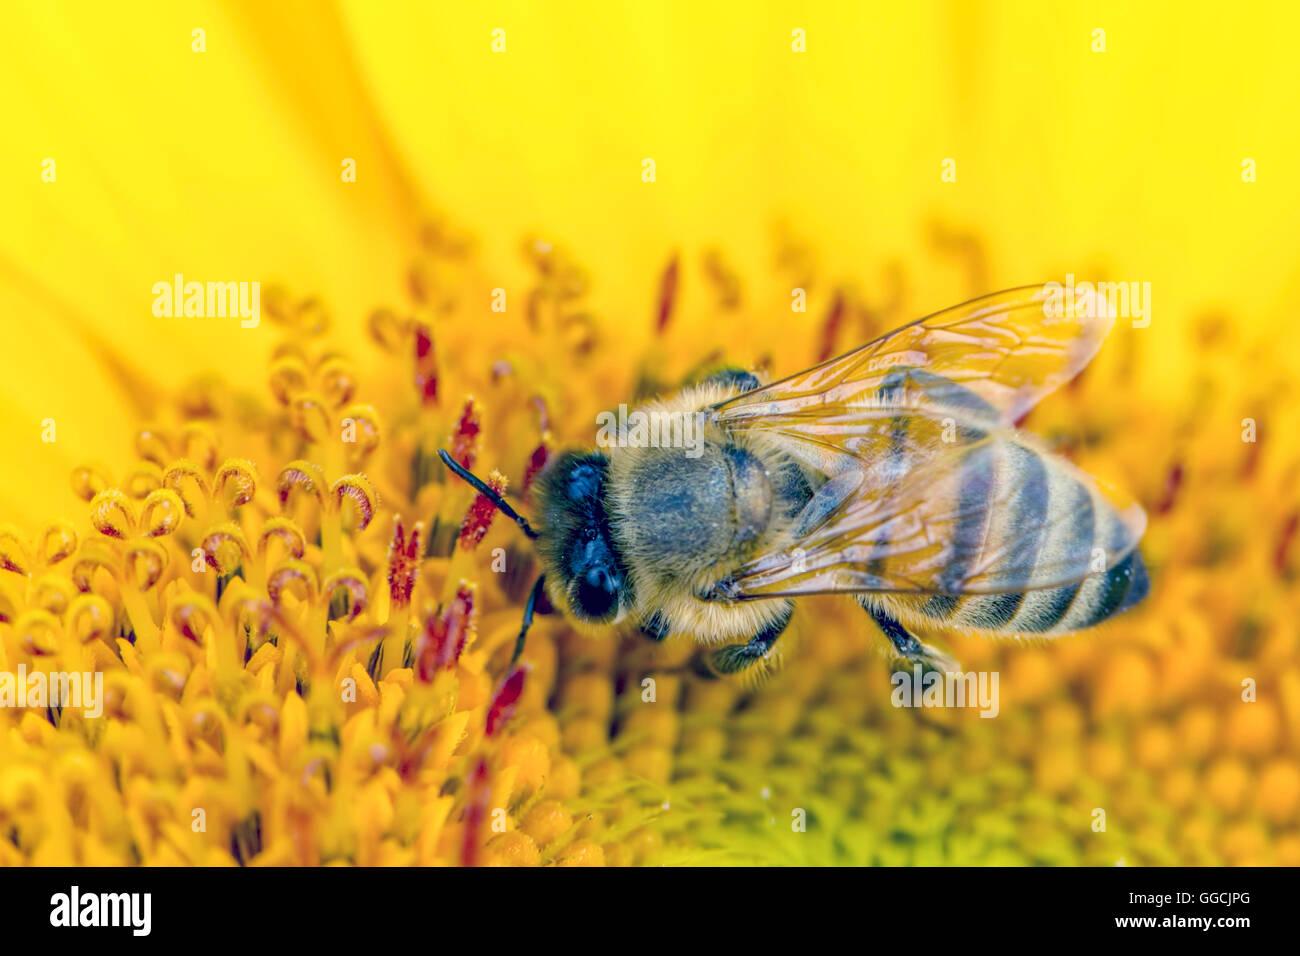 Bee gathers pollen. - Stock Image